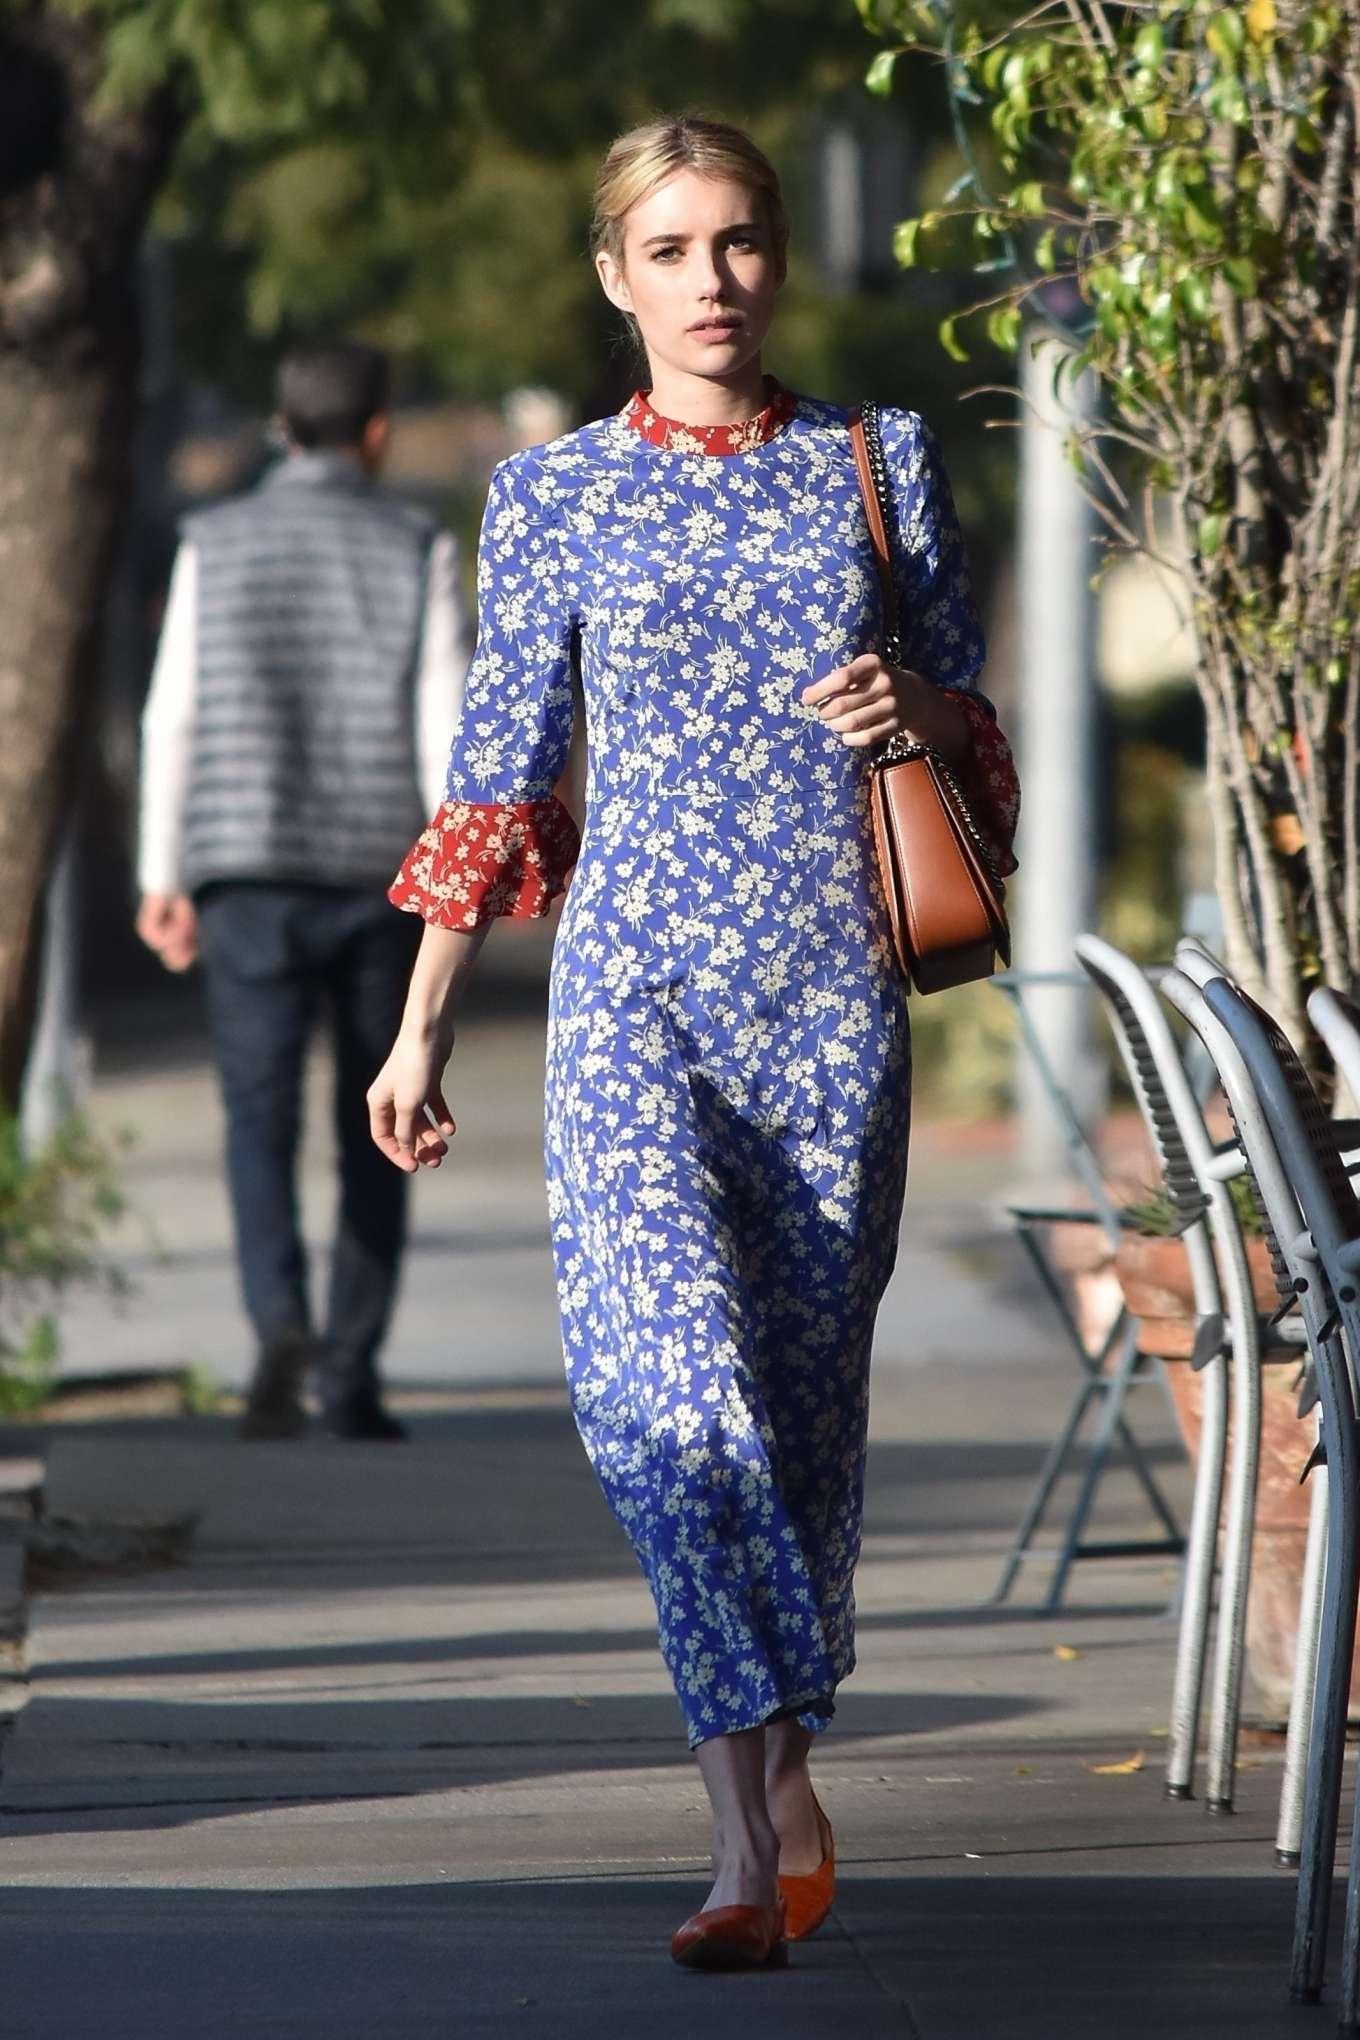 Emma Roberts 2019 : Emma Roberts at Blue Bottle Coffee Shop in Los Feliz-18